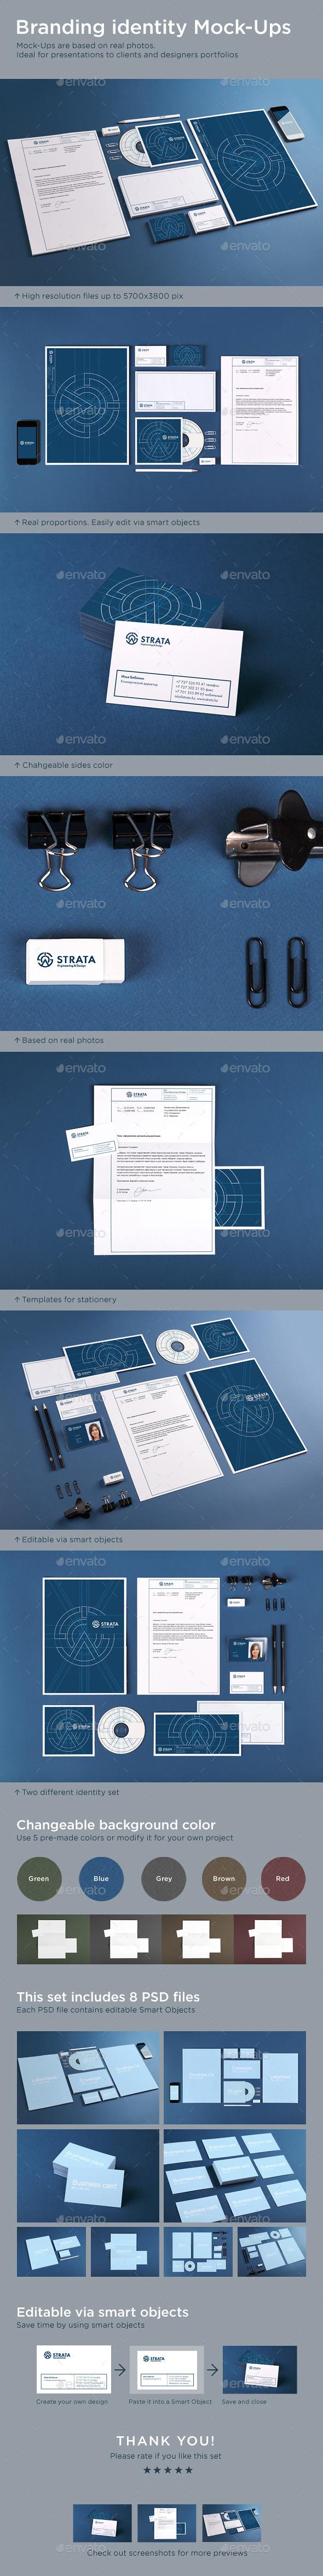 GraphicRiver Branding Identity Mock-Ups 9218158